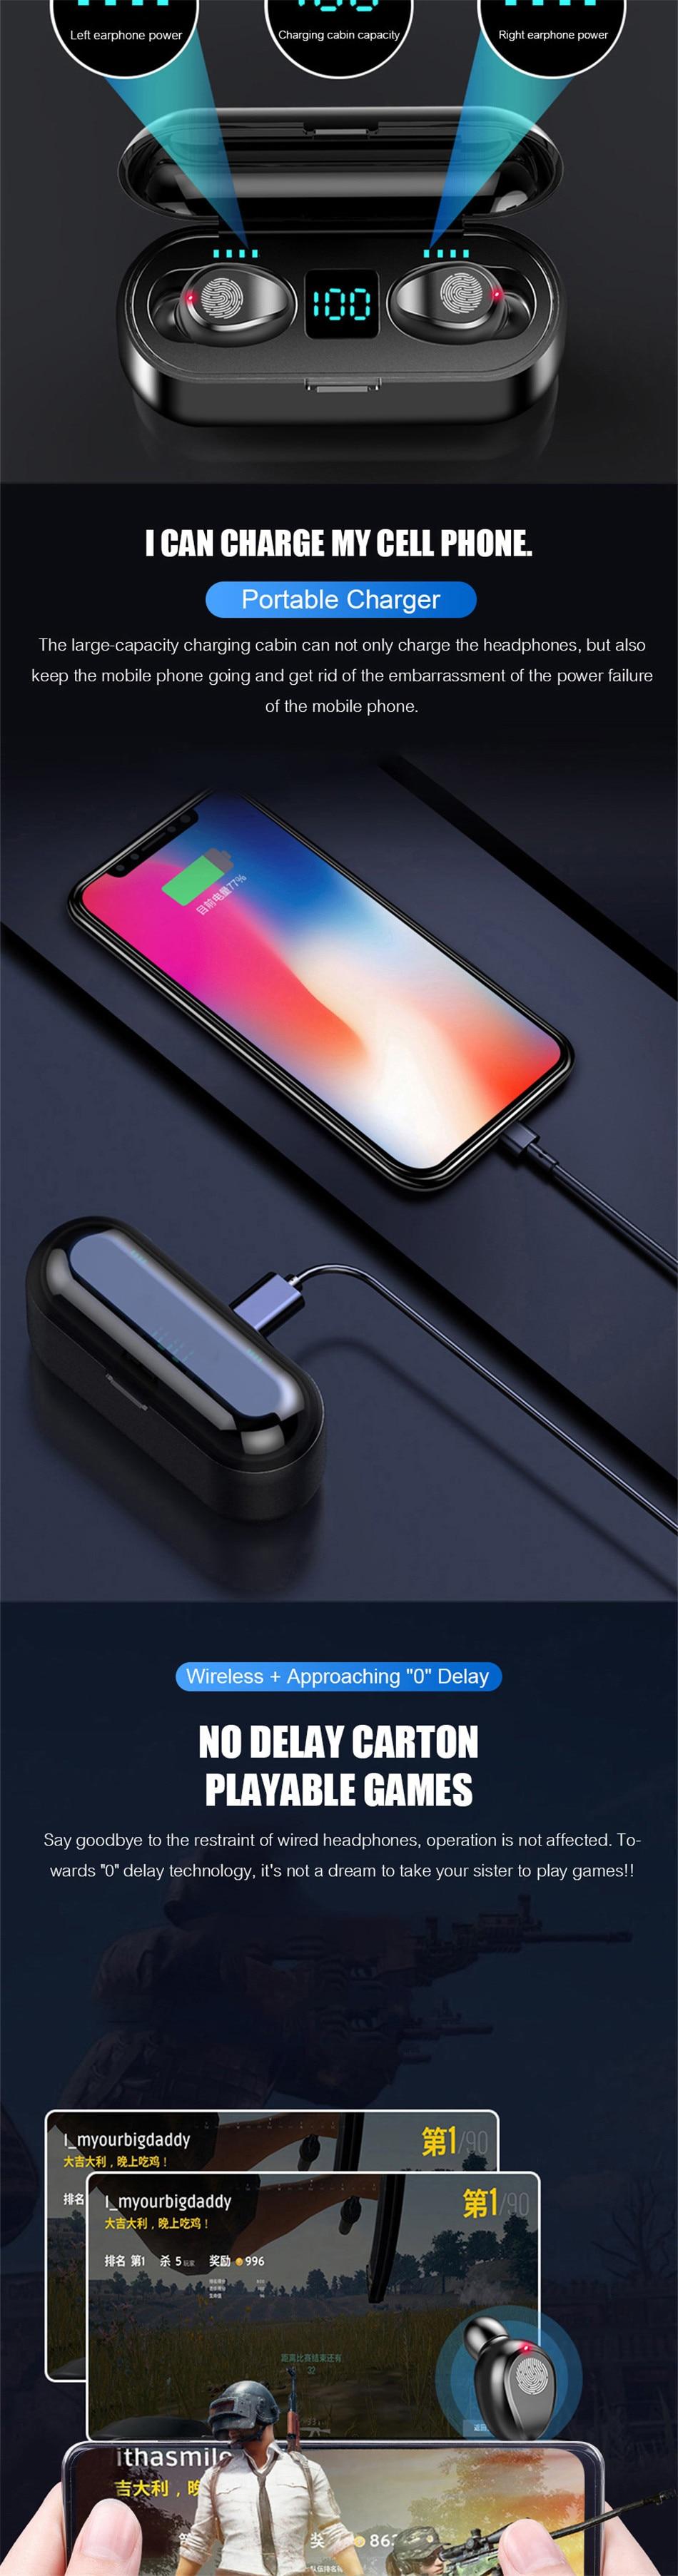 F9-触摸-无线蓝牙耳机-详情-19_03